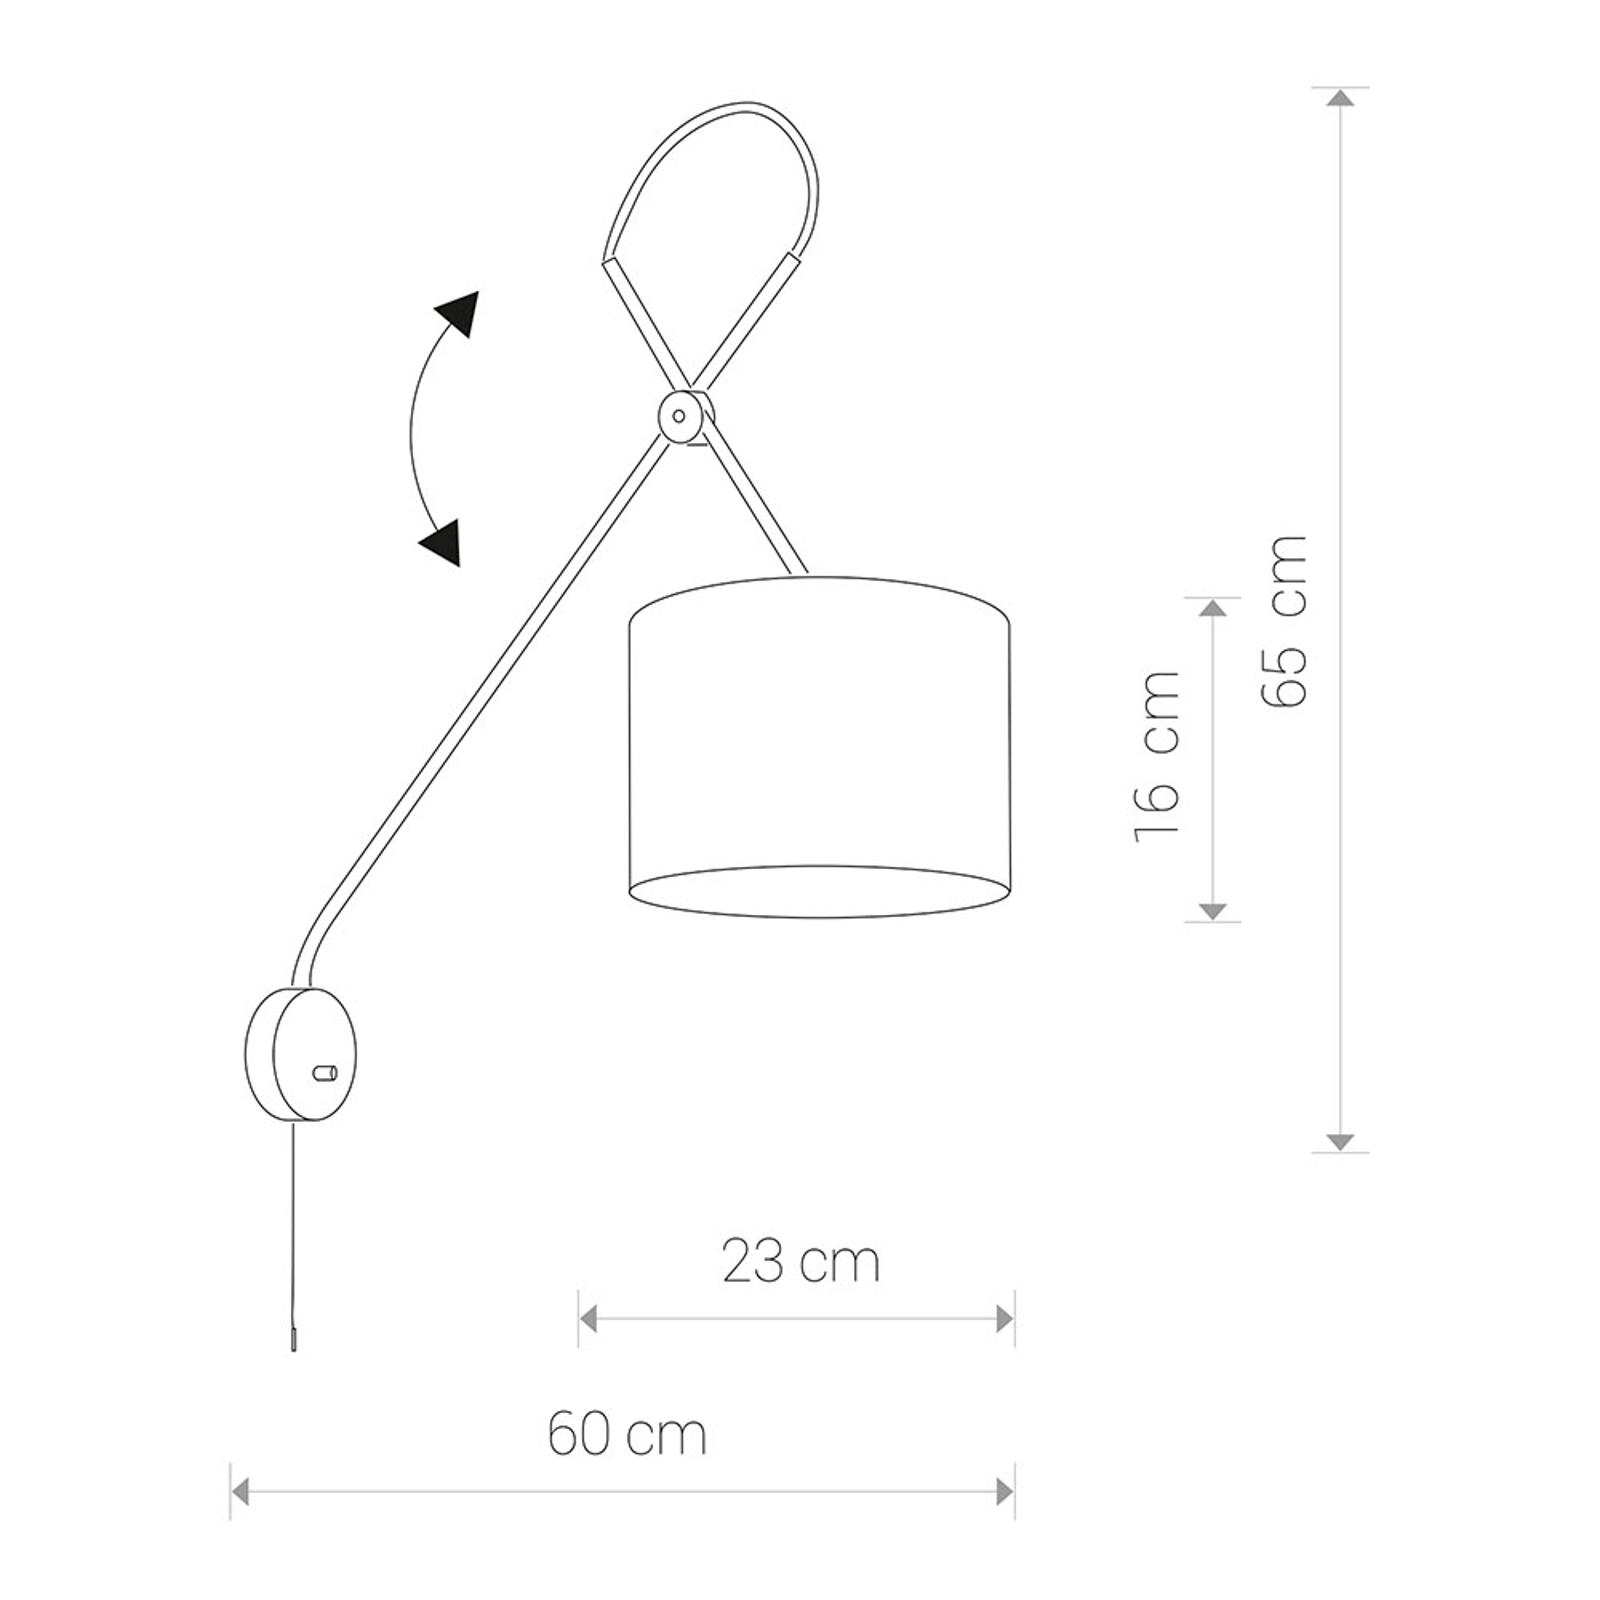 Wandlamp Viper met flexibele frame, zwart